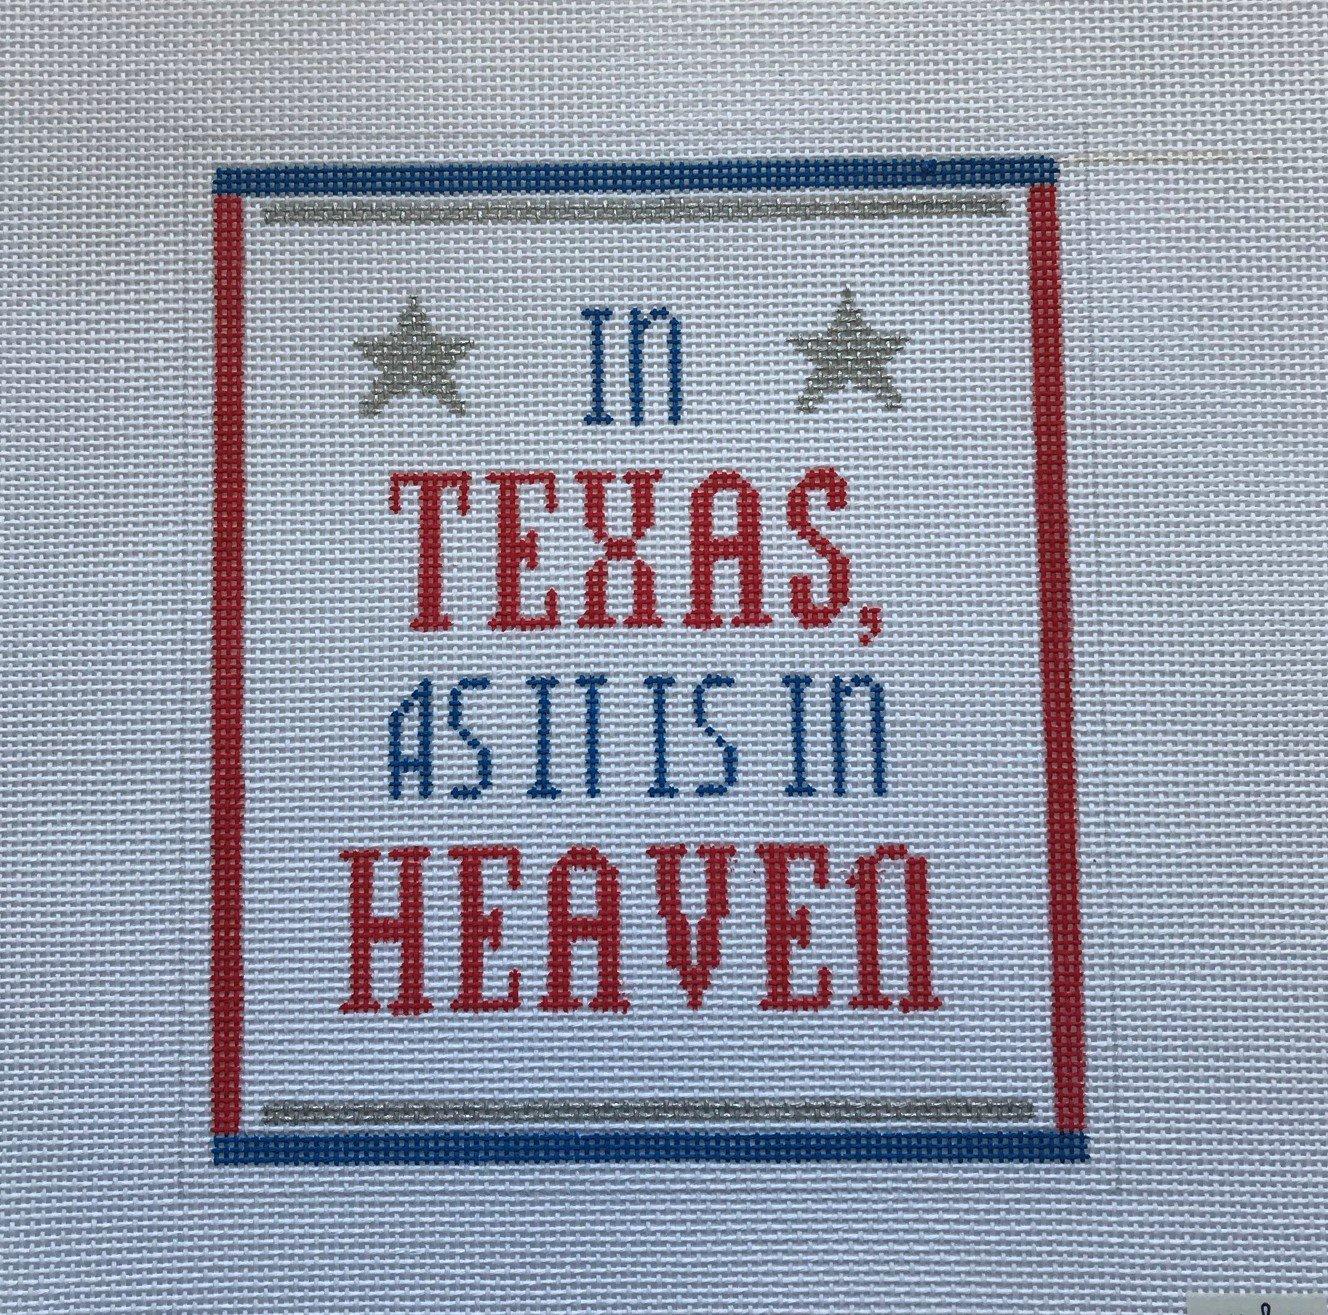 PS/SAY019 In Texas, As It Is In Heaven